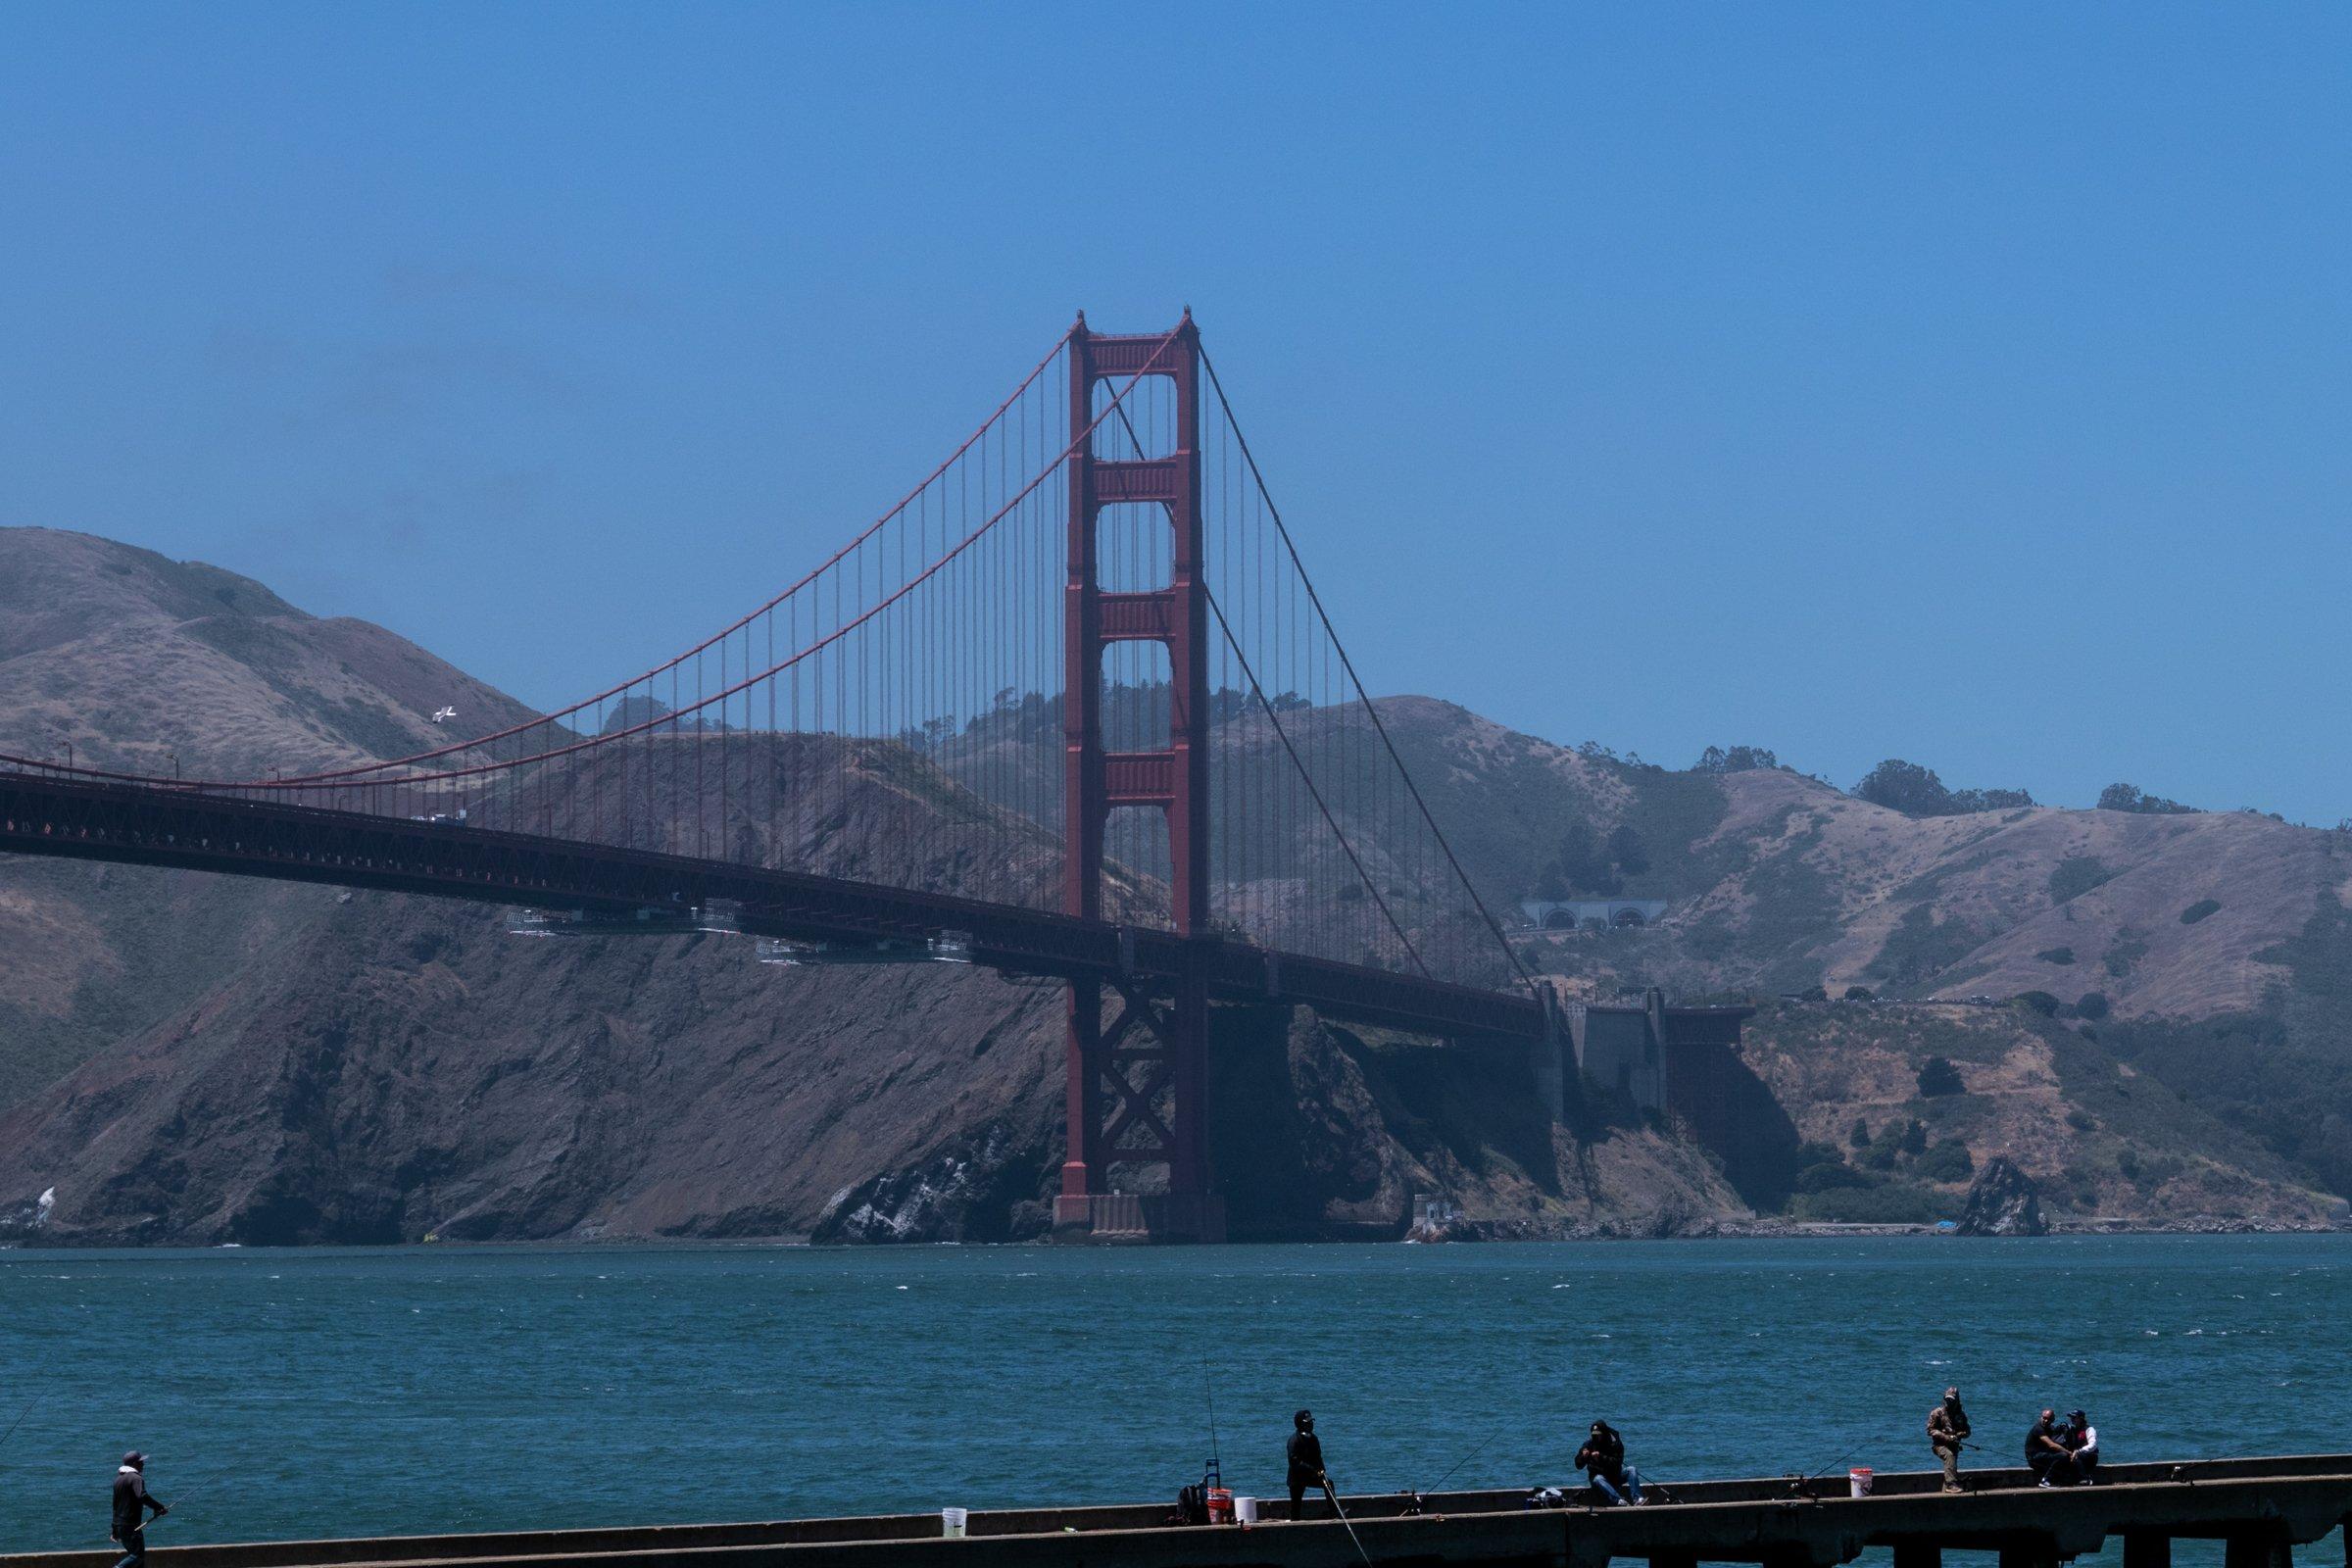 Golden Gate Bridge In San Francisco Near Hills